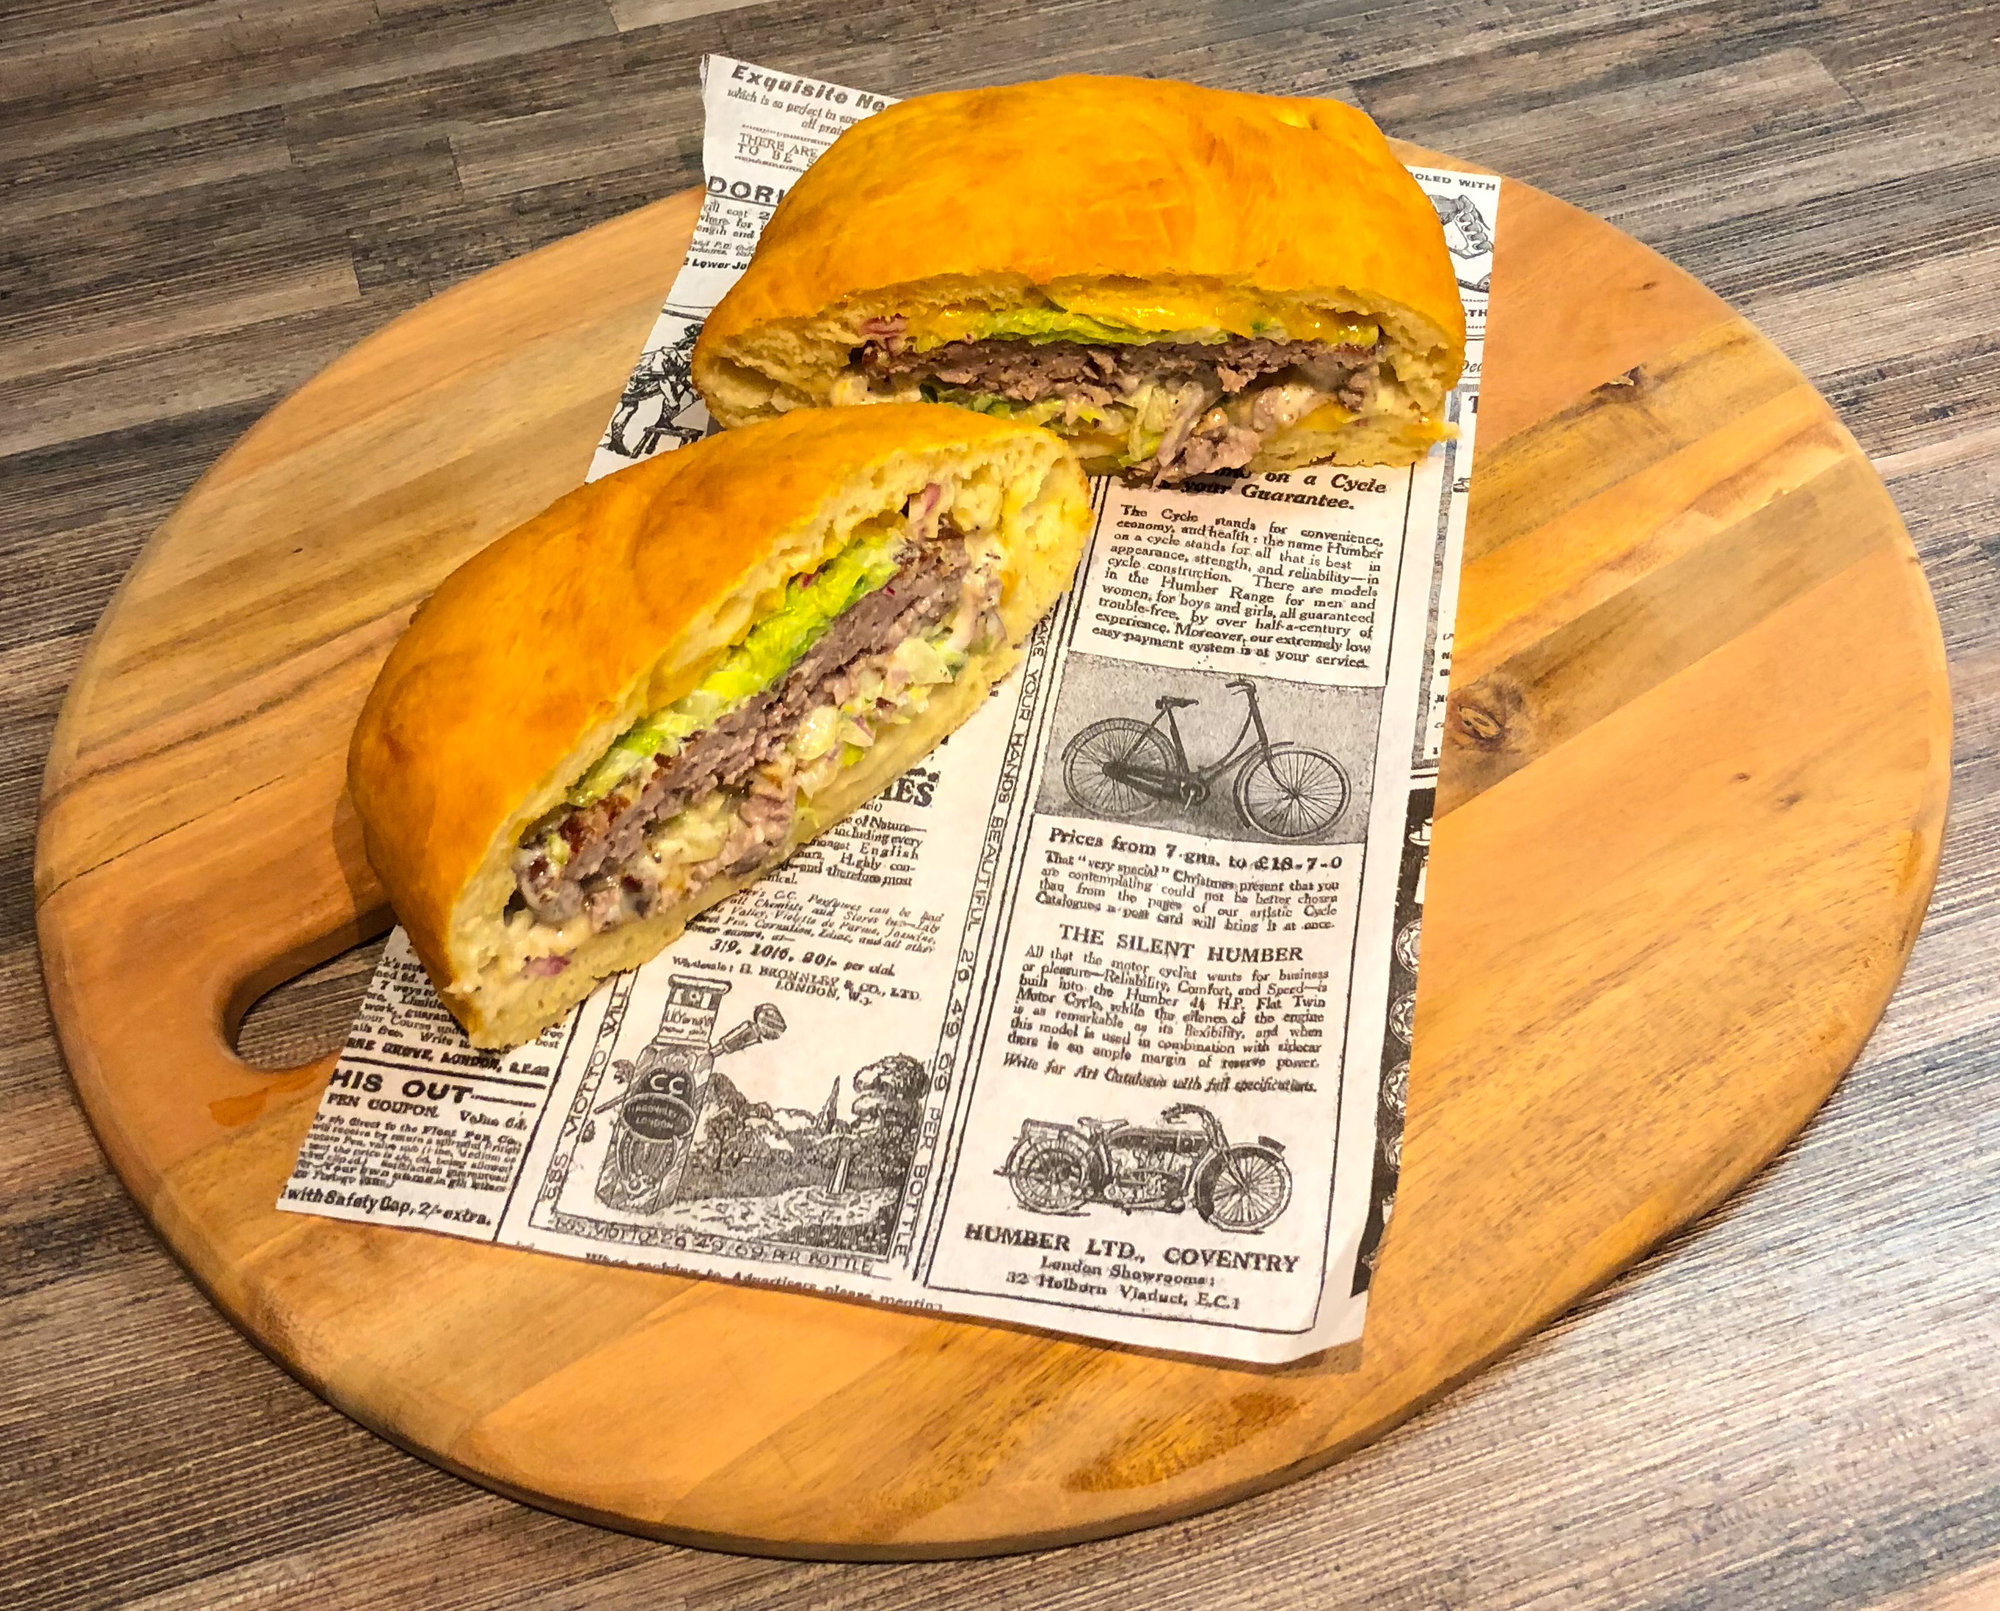 otto korzo fried burger best burger from eastfreezeland nyc grillforum und bbq www. Black Bedroom Furniture Sets. Home Design Ideas